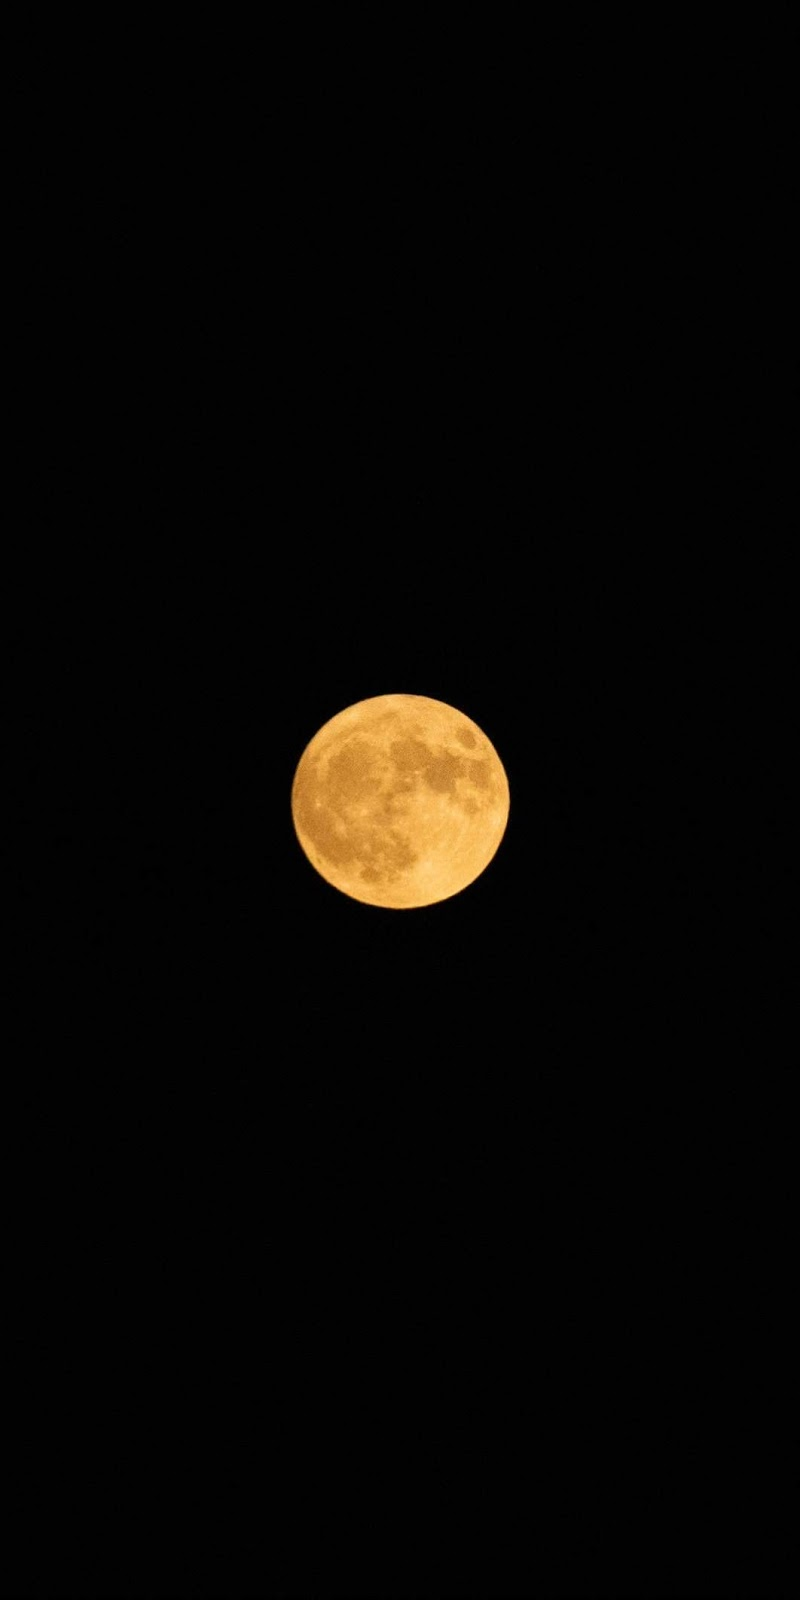 Full moon in the dark night